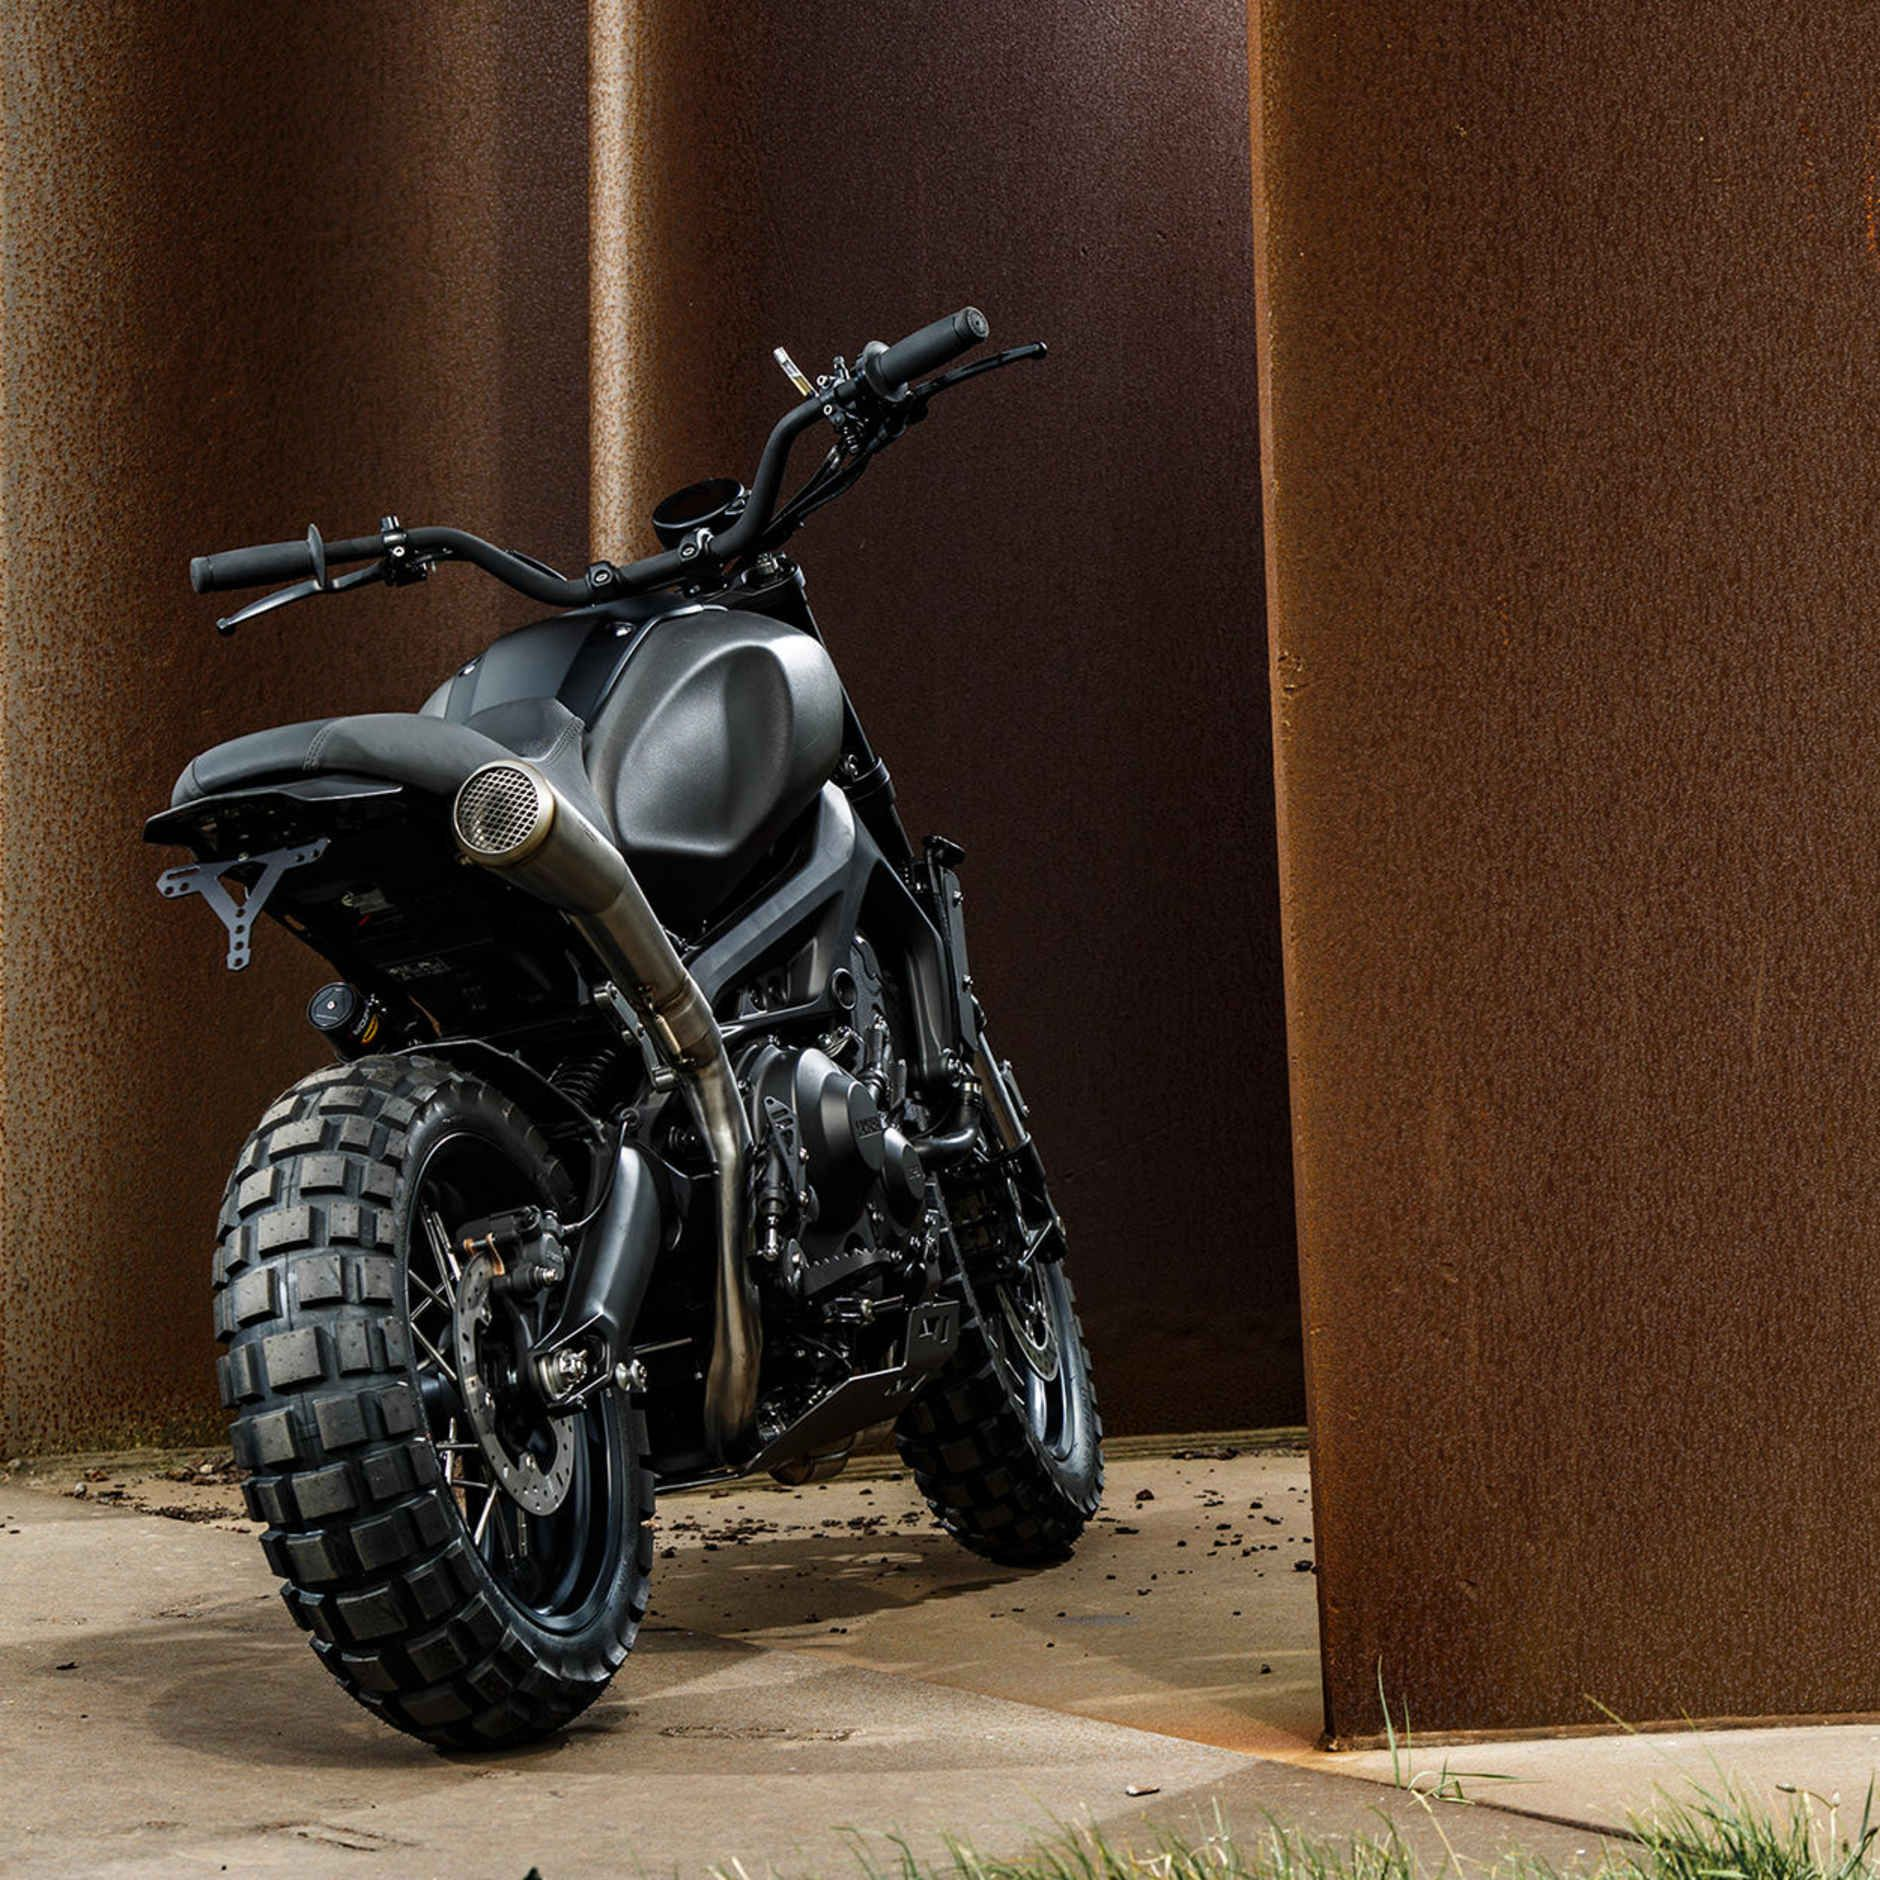 Moto yamaha scrambler cars motorcycles bobber forward mt09 yamaha - Wrenchmonkees Transformed A Yamaha Into A Flat Out Beauty